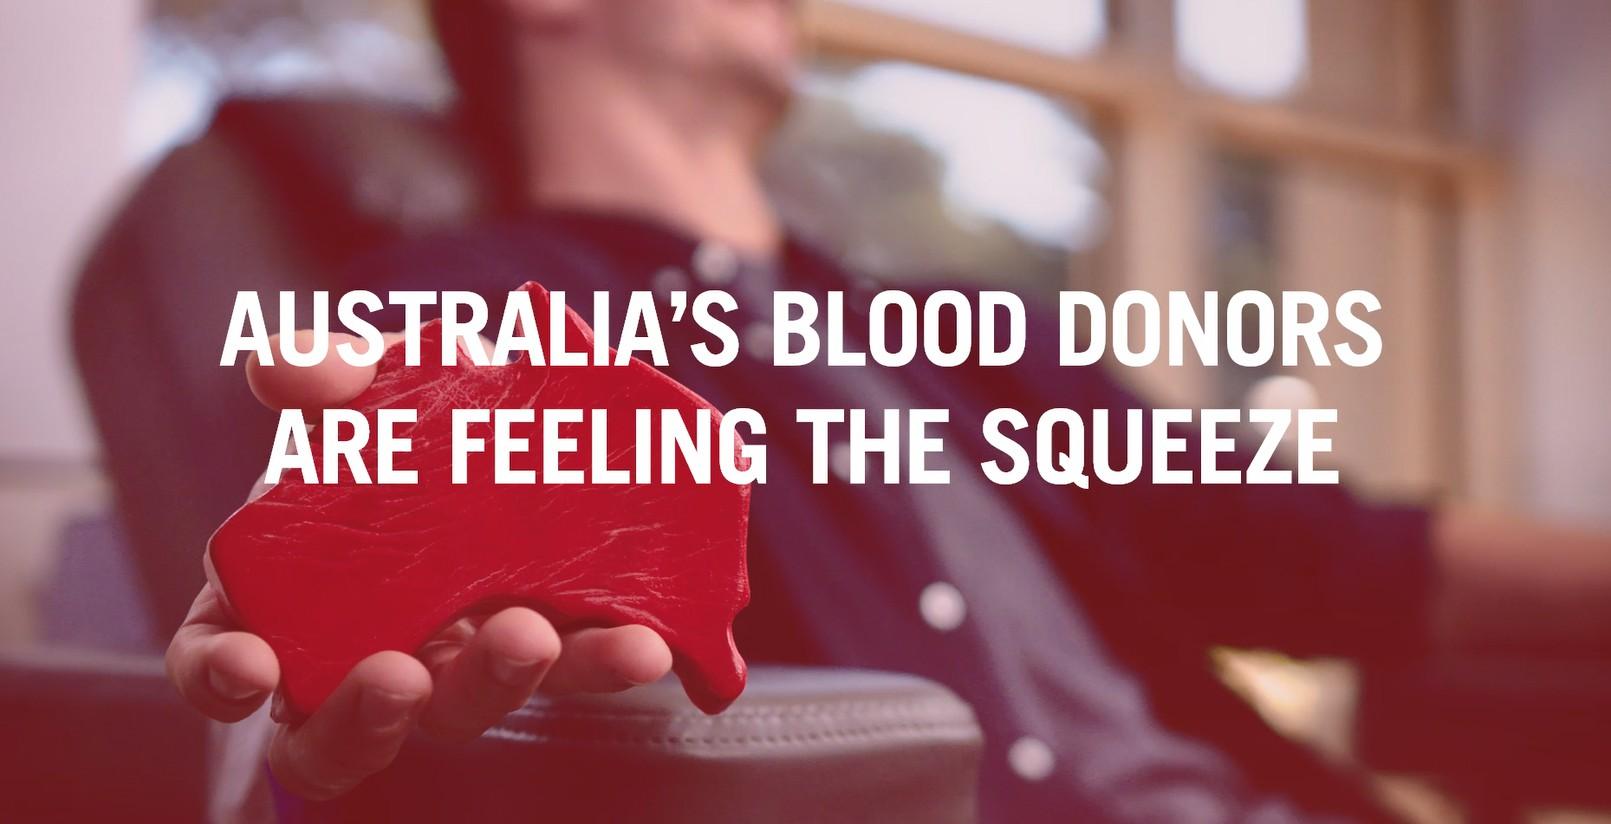 The Australian Red Cross Blood Service | LinkedIn